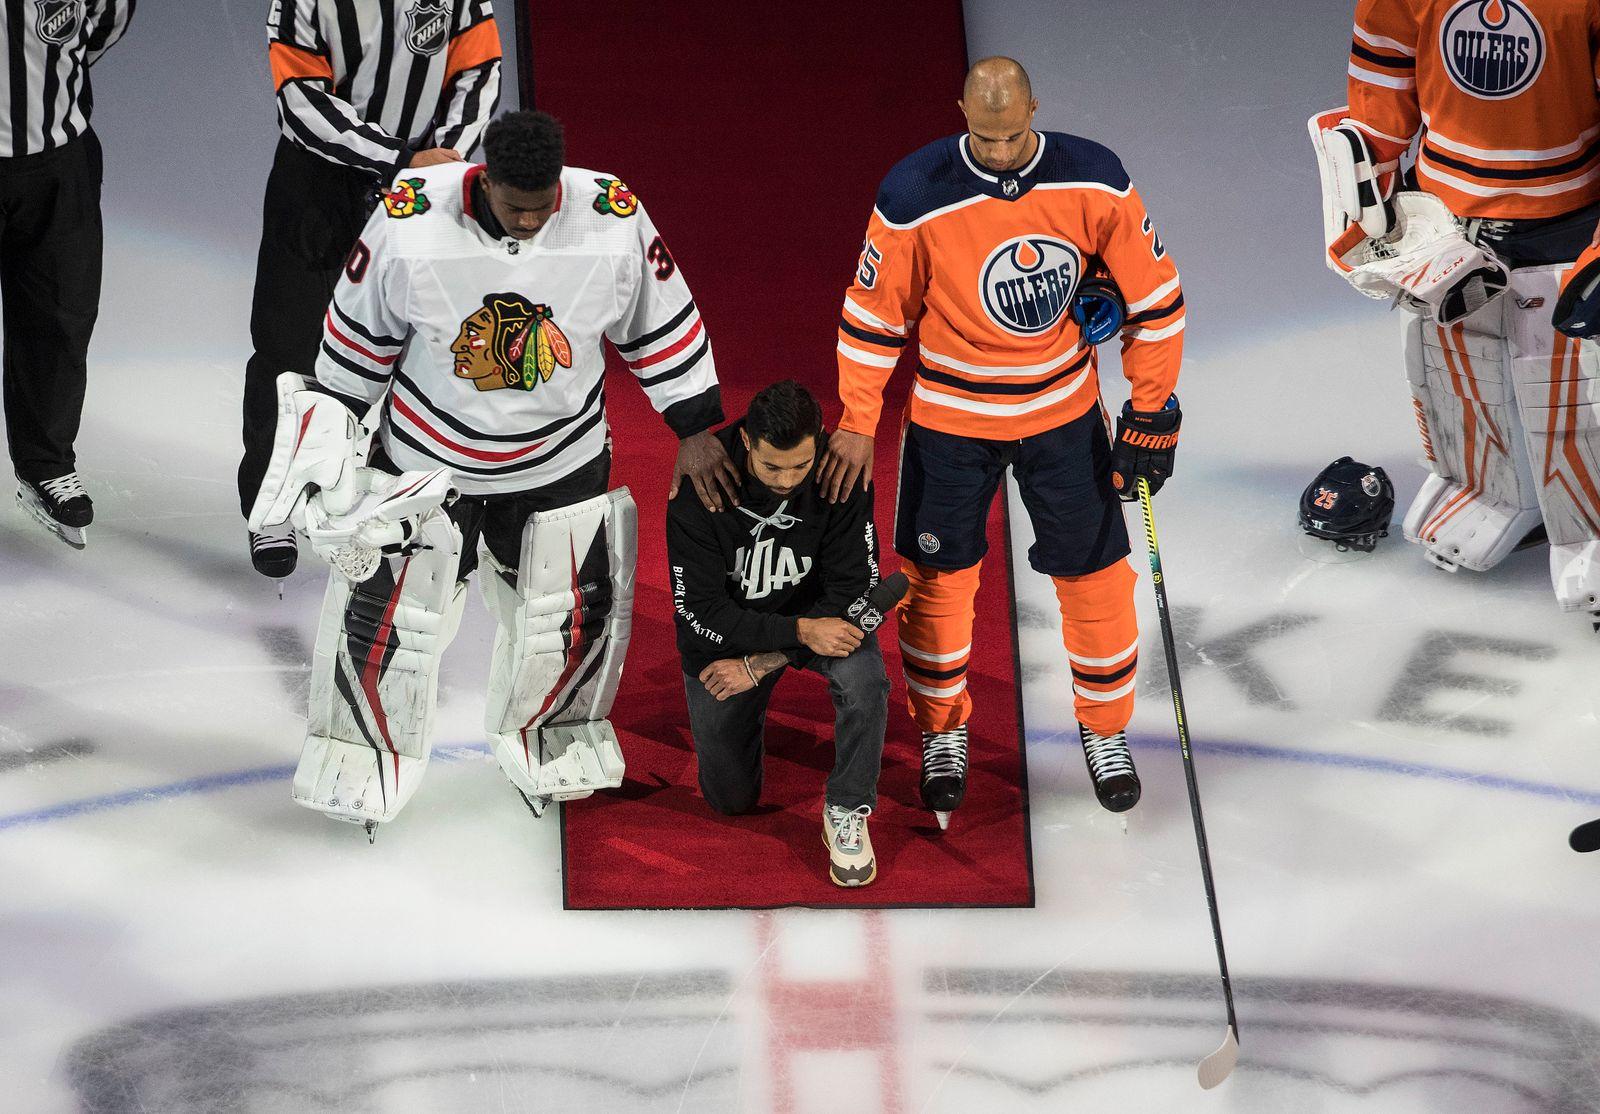 Edmonton Oilers - Chicago Blackhawks